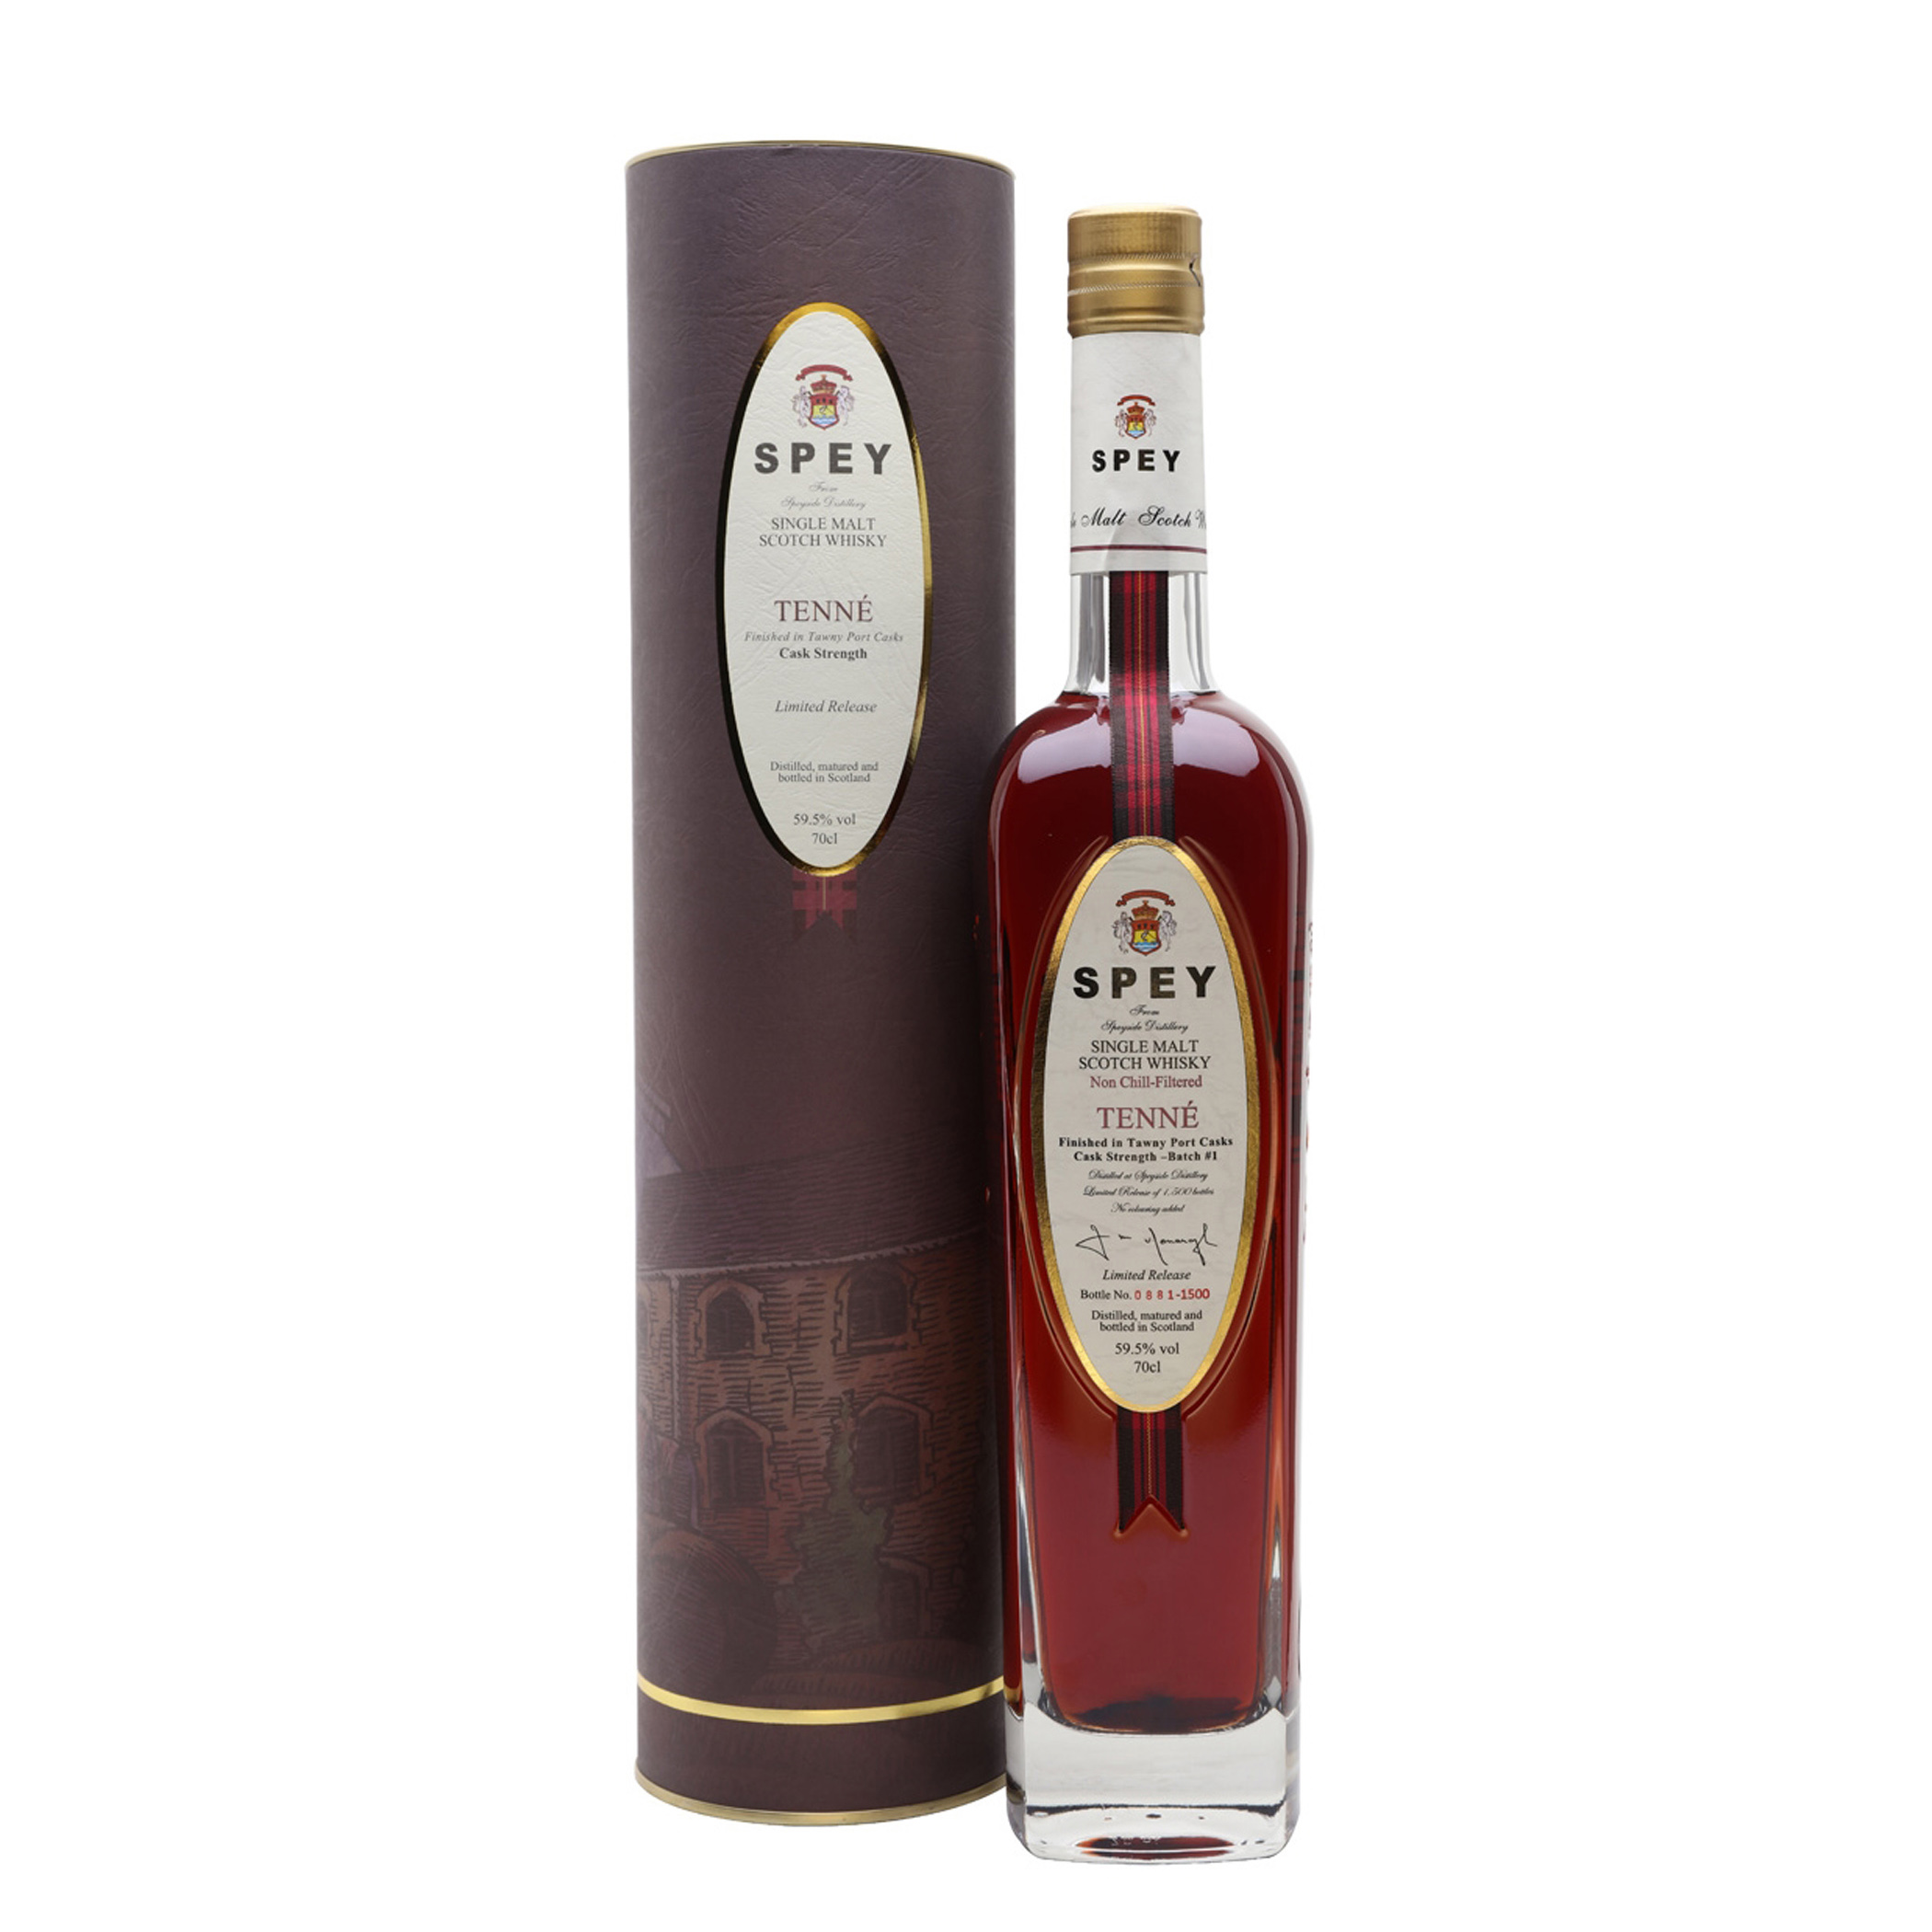 Spey Tenne Whisky